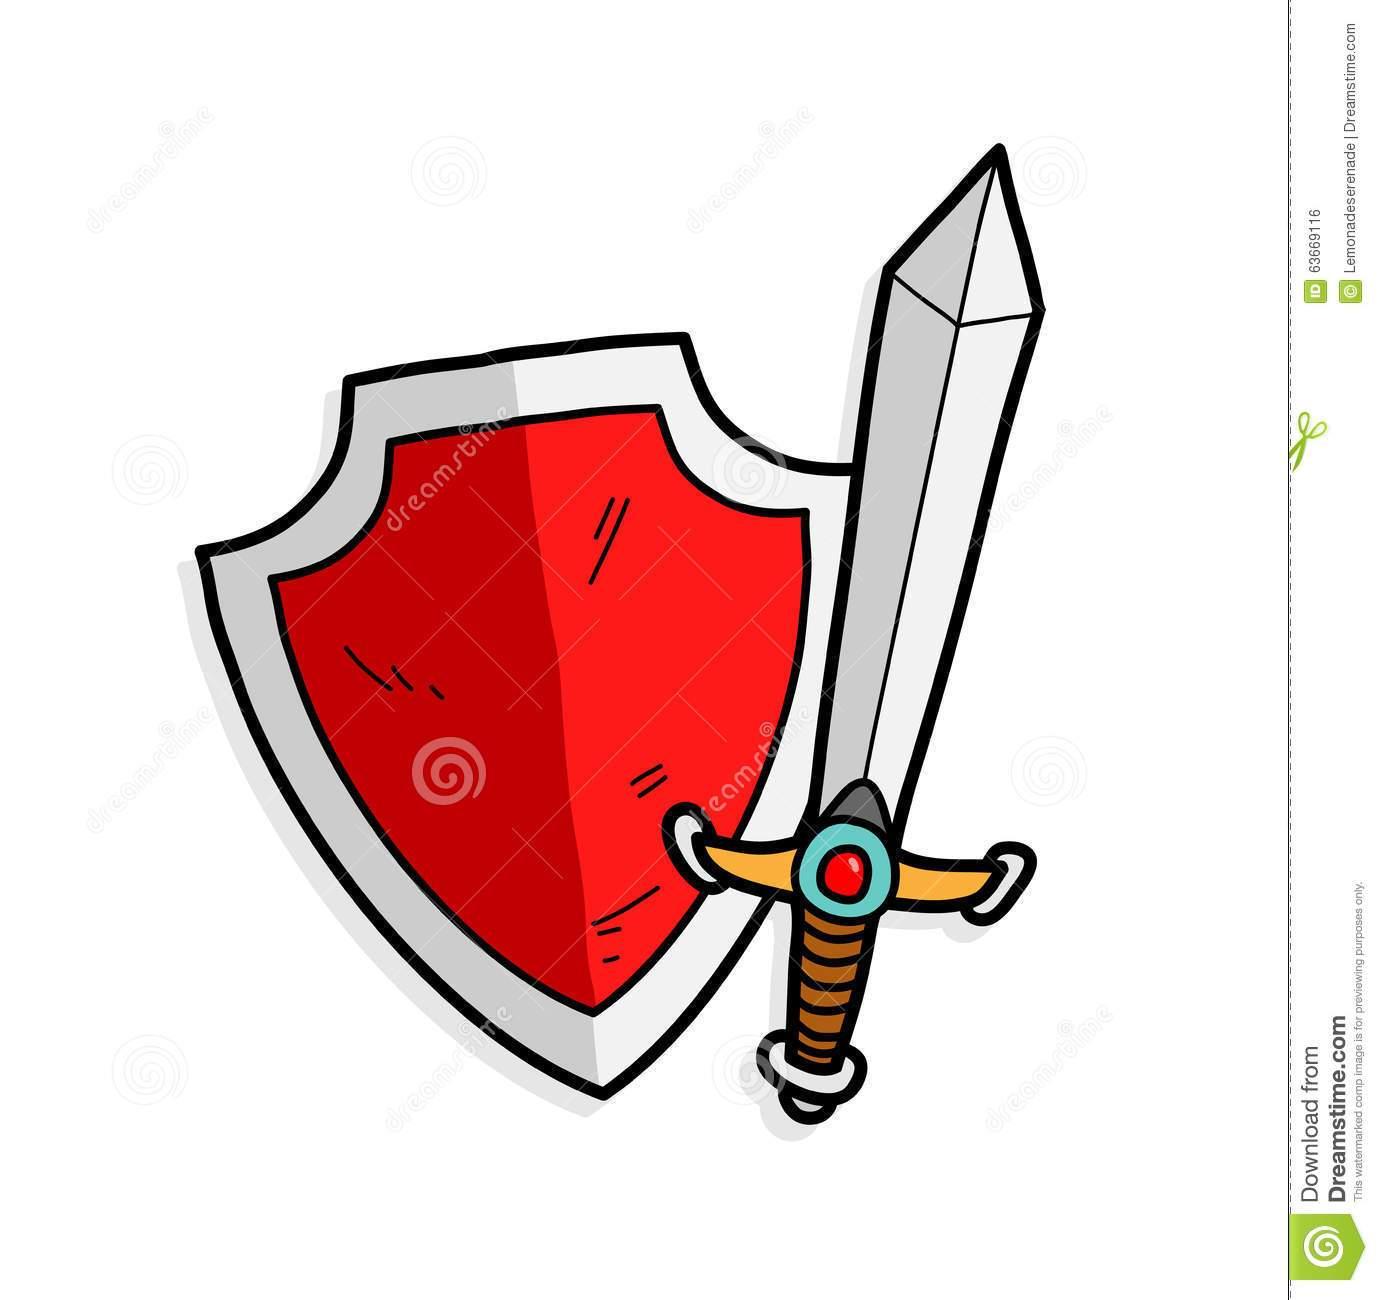 Clipart shield sword. And portal